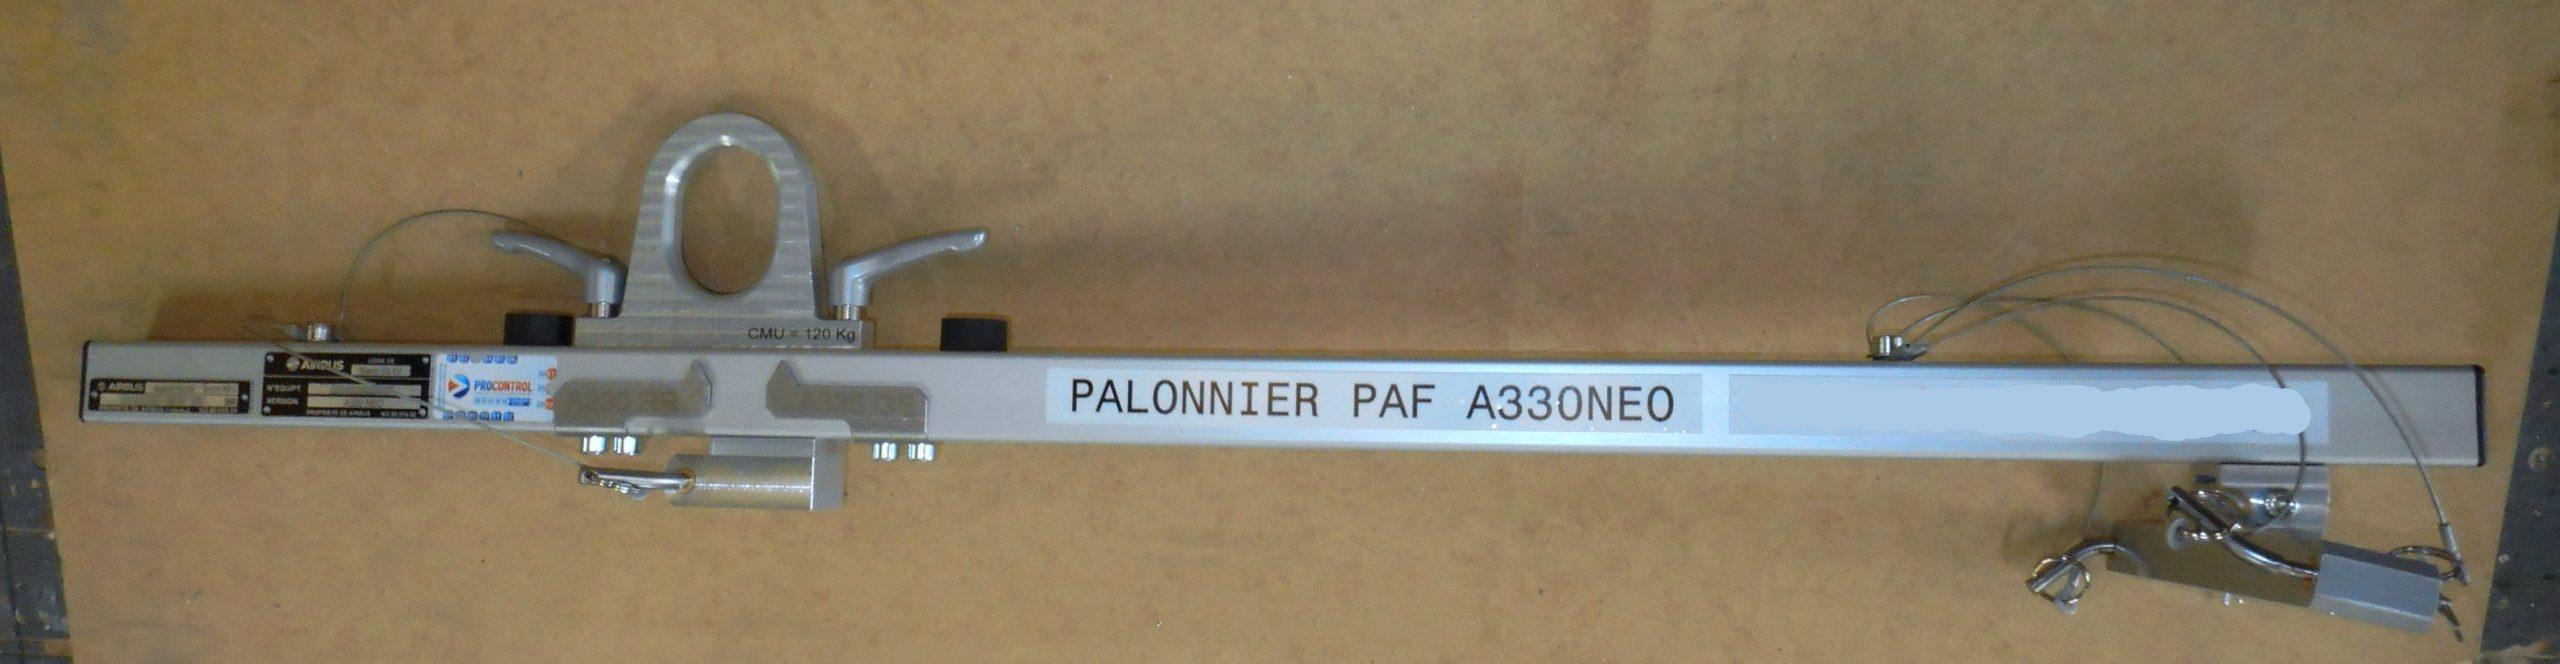 Palonnier PAF